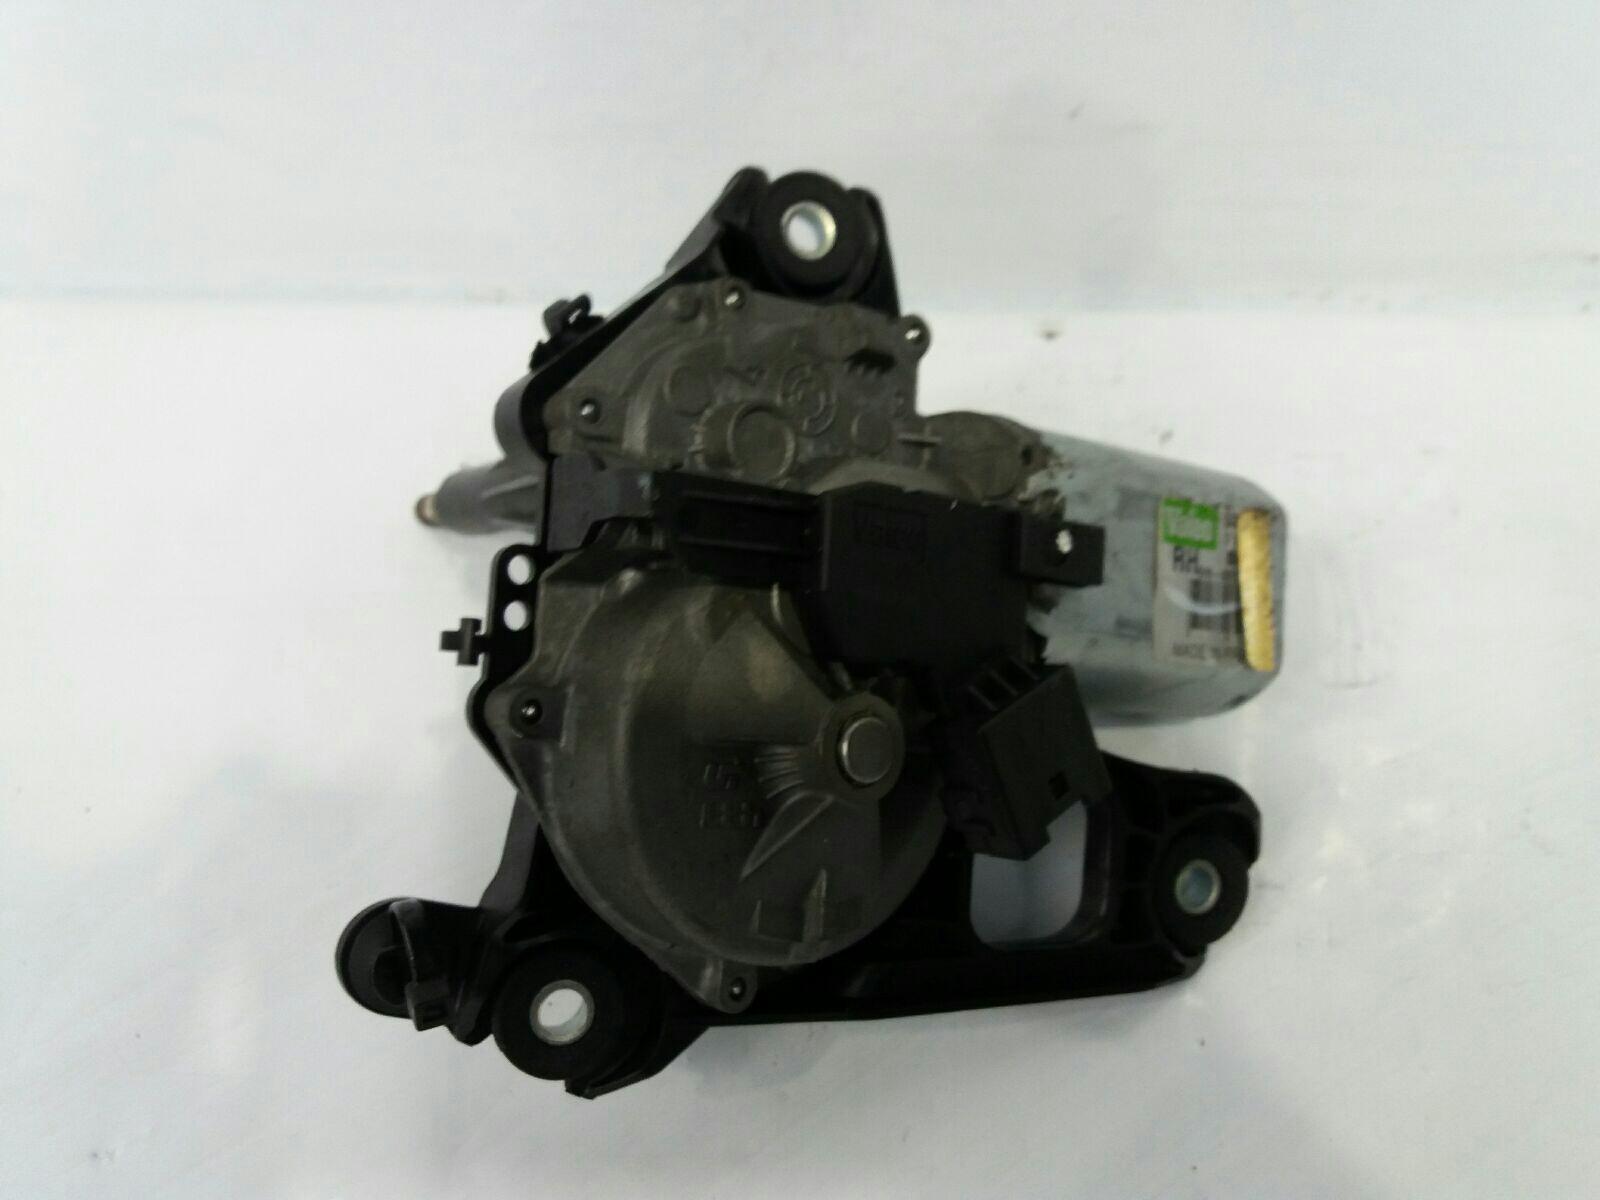 MINI Clubman 2007 To 2015 Cooper S Wiper Motor Rear